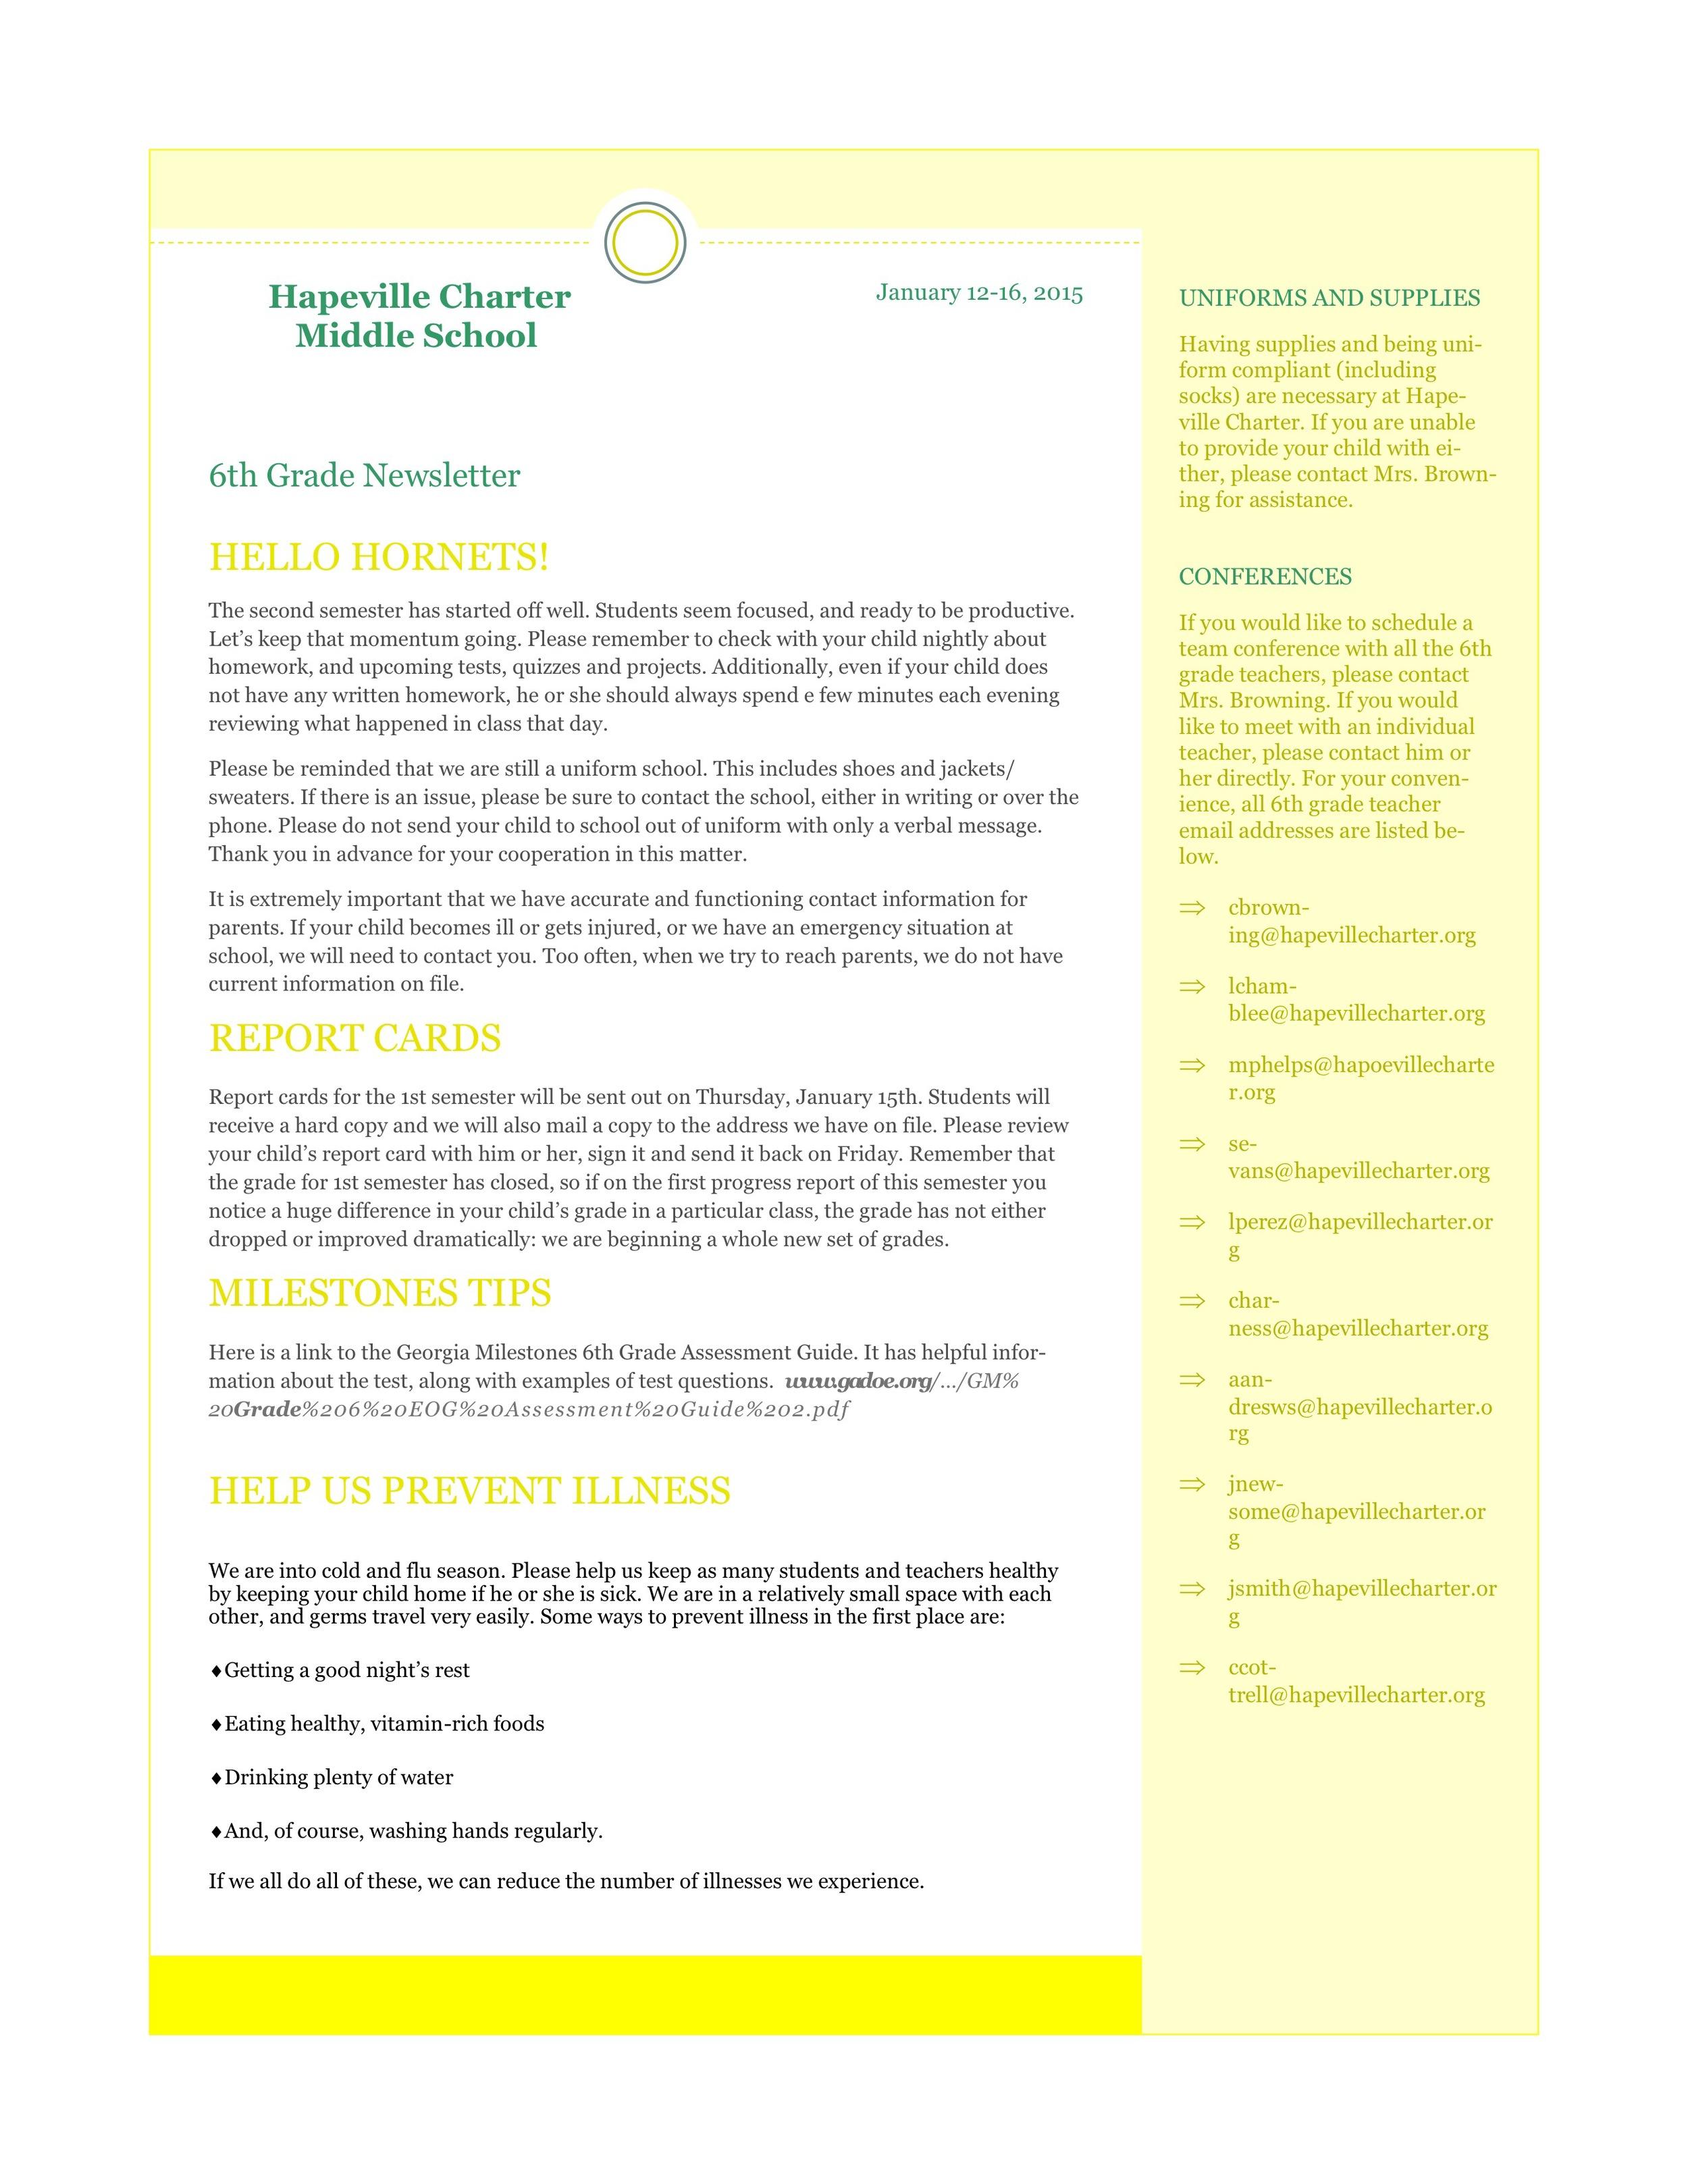 Newsletter Image6th grade January 12-16.jpeg